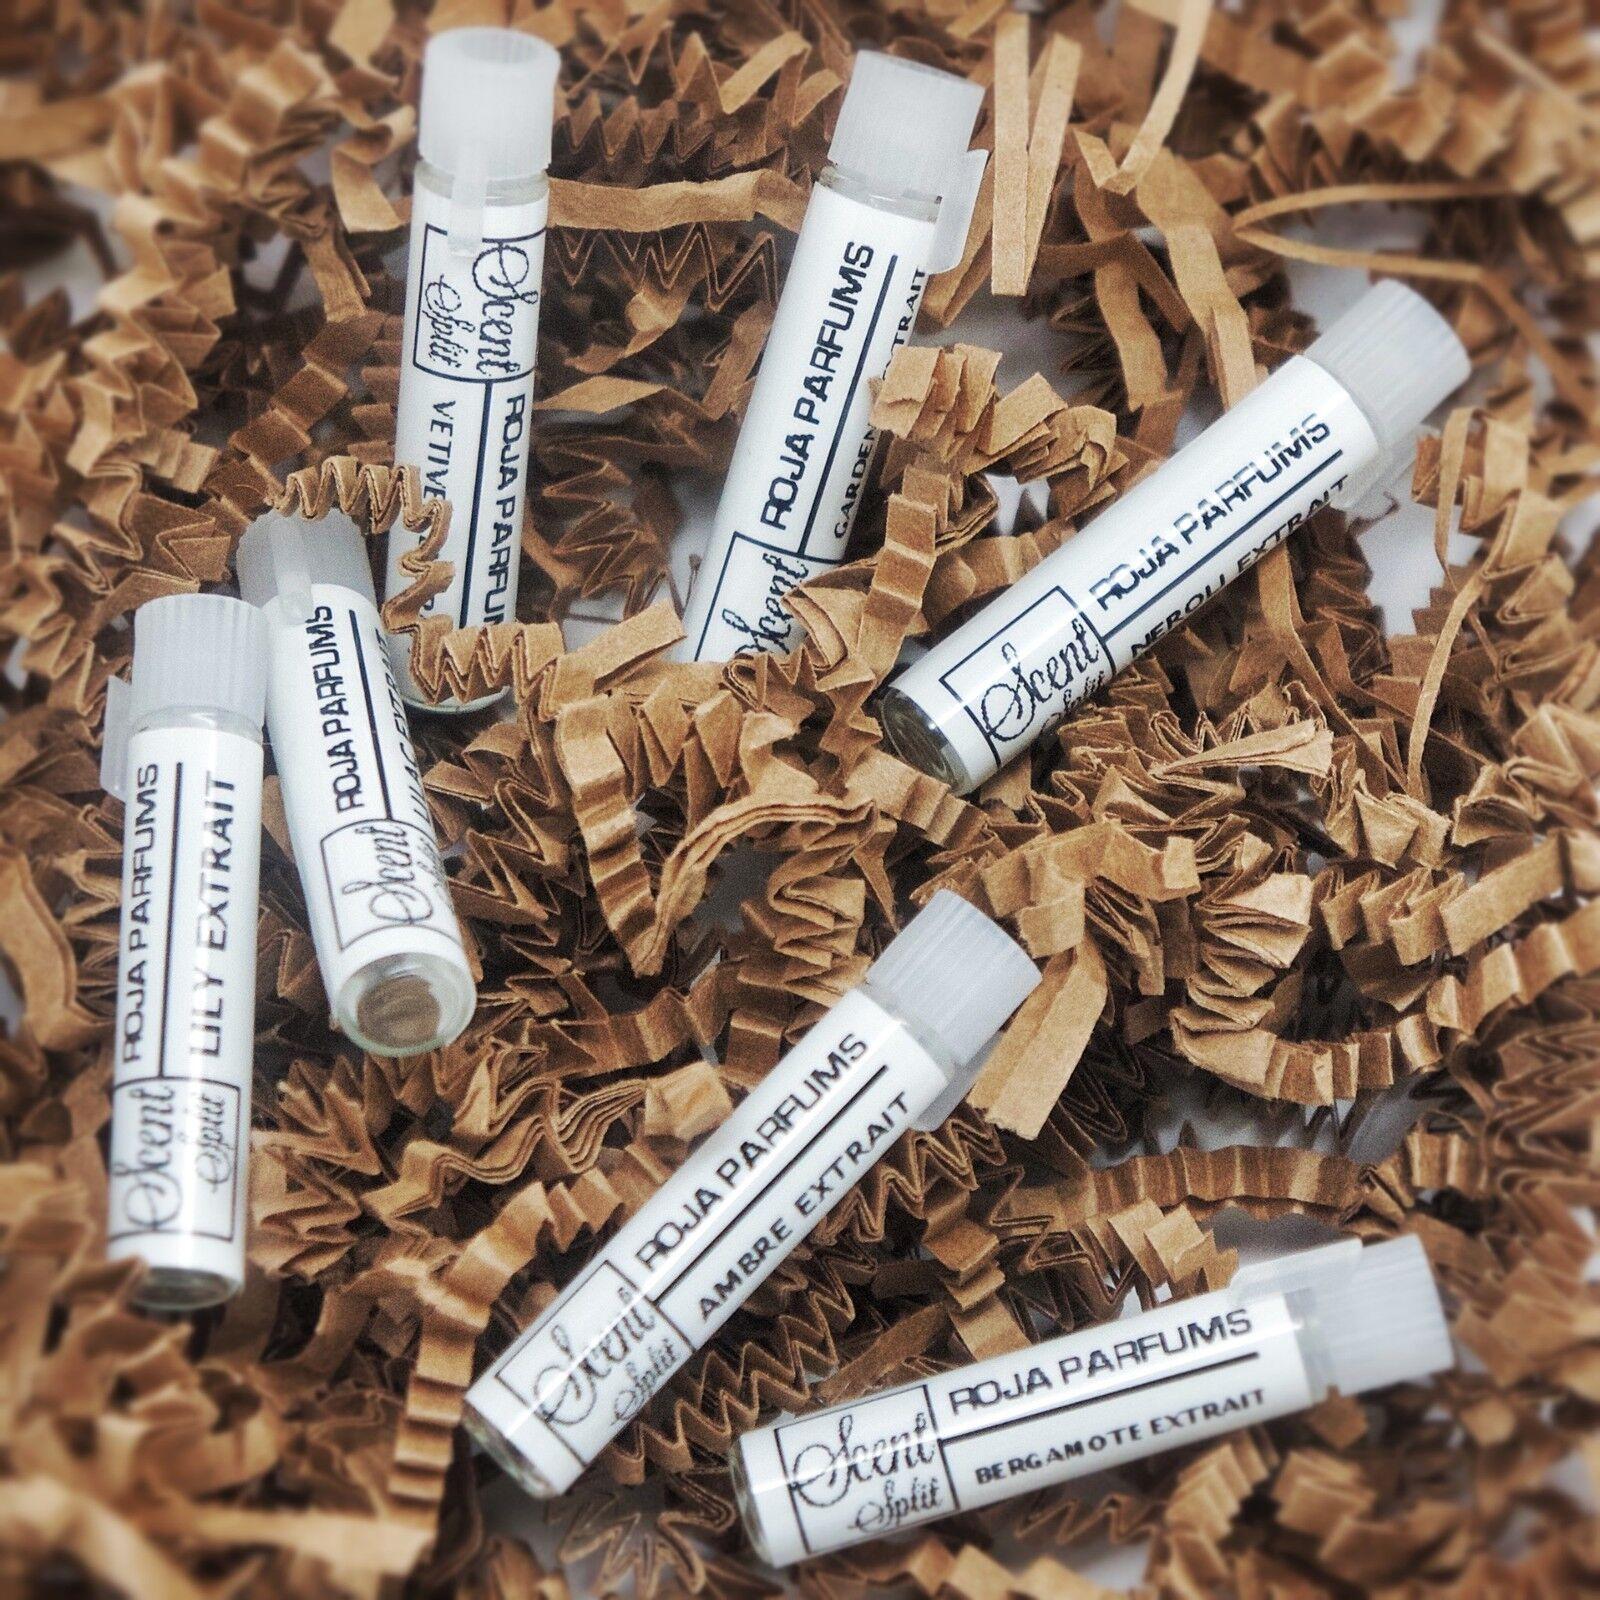 Roja Dove parfum extrait samples Neroli, Ambre, Vetiver, Lily ...